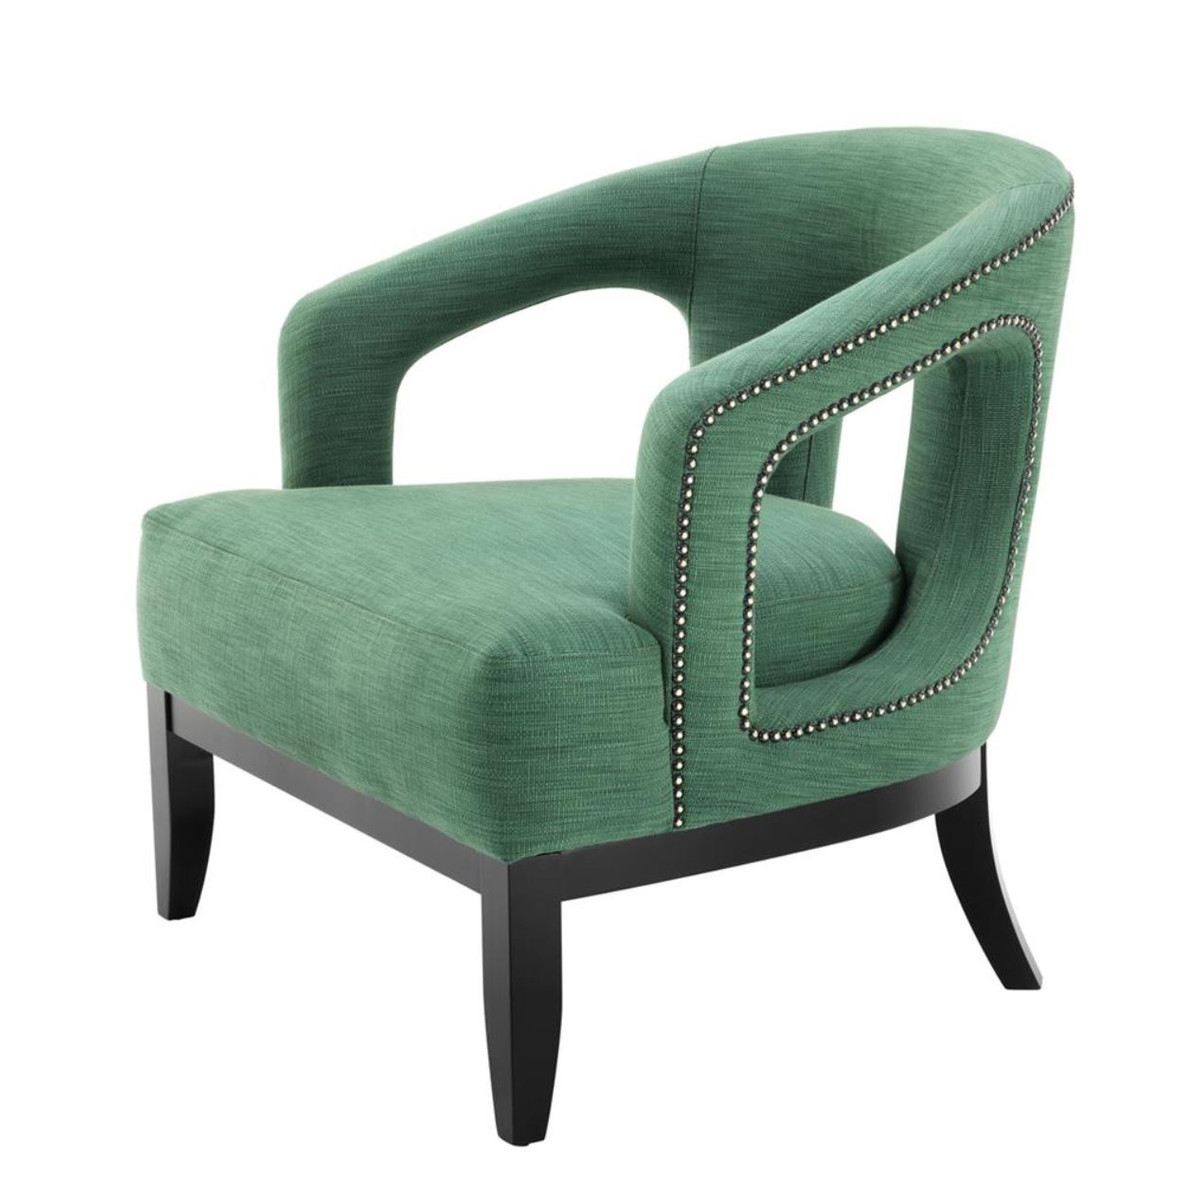 Casa Padrino Luxus Designer Sessel Hotel Sessel Möbel